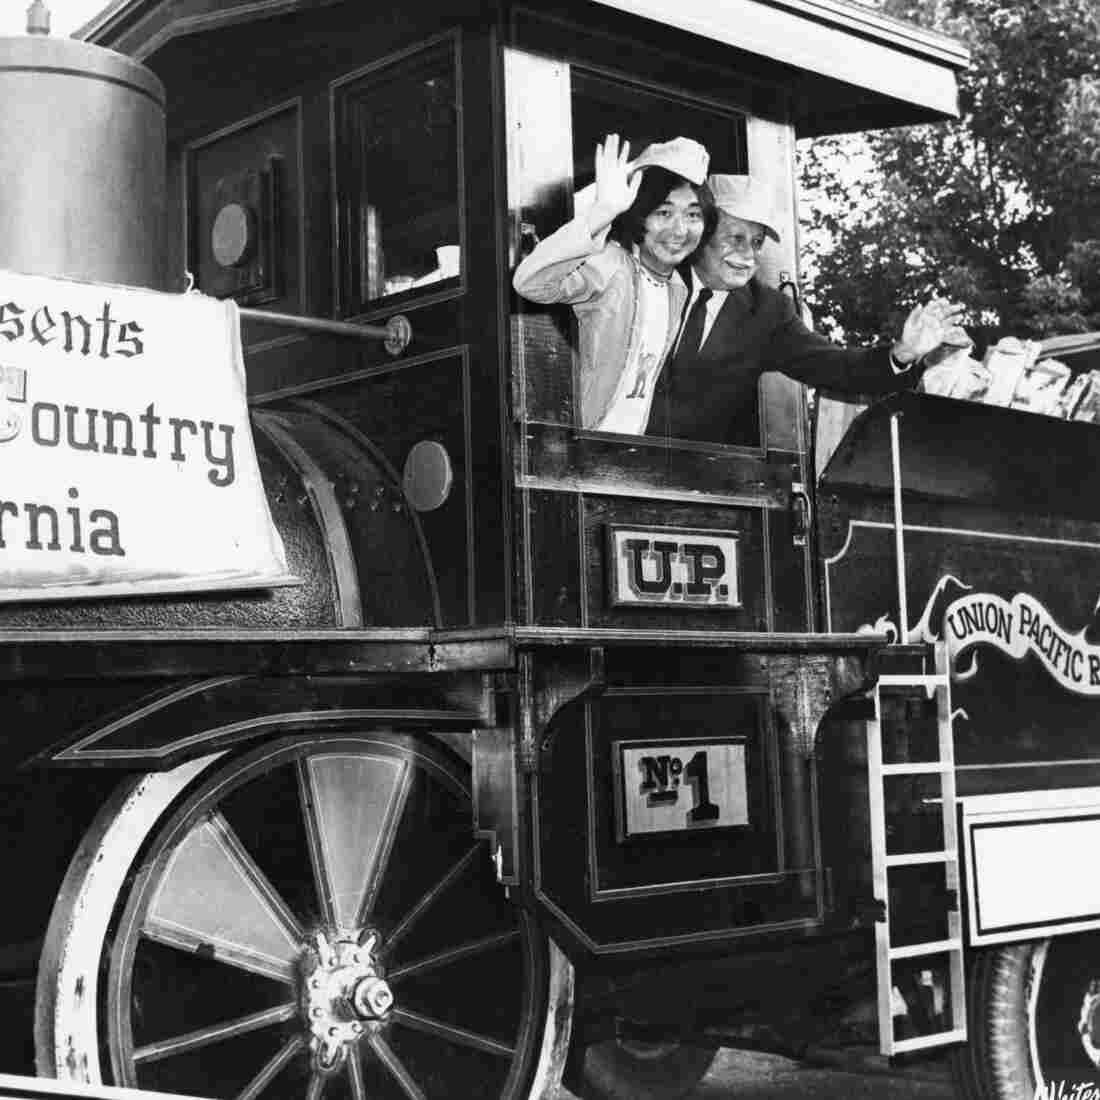 Seiji Ozawa and Arthur Fielder, aboard a train during Tanglewood on Parade, 1975.